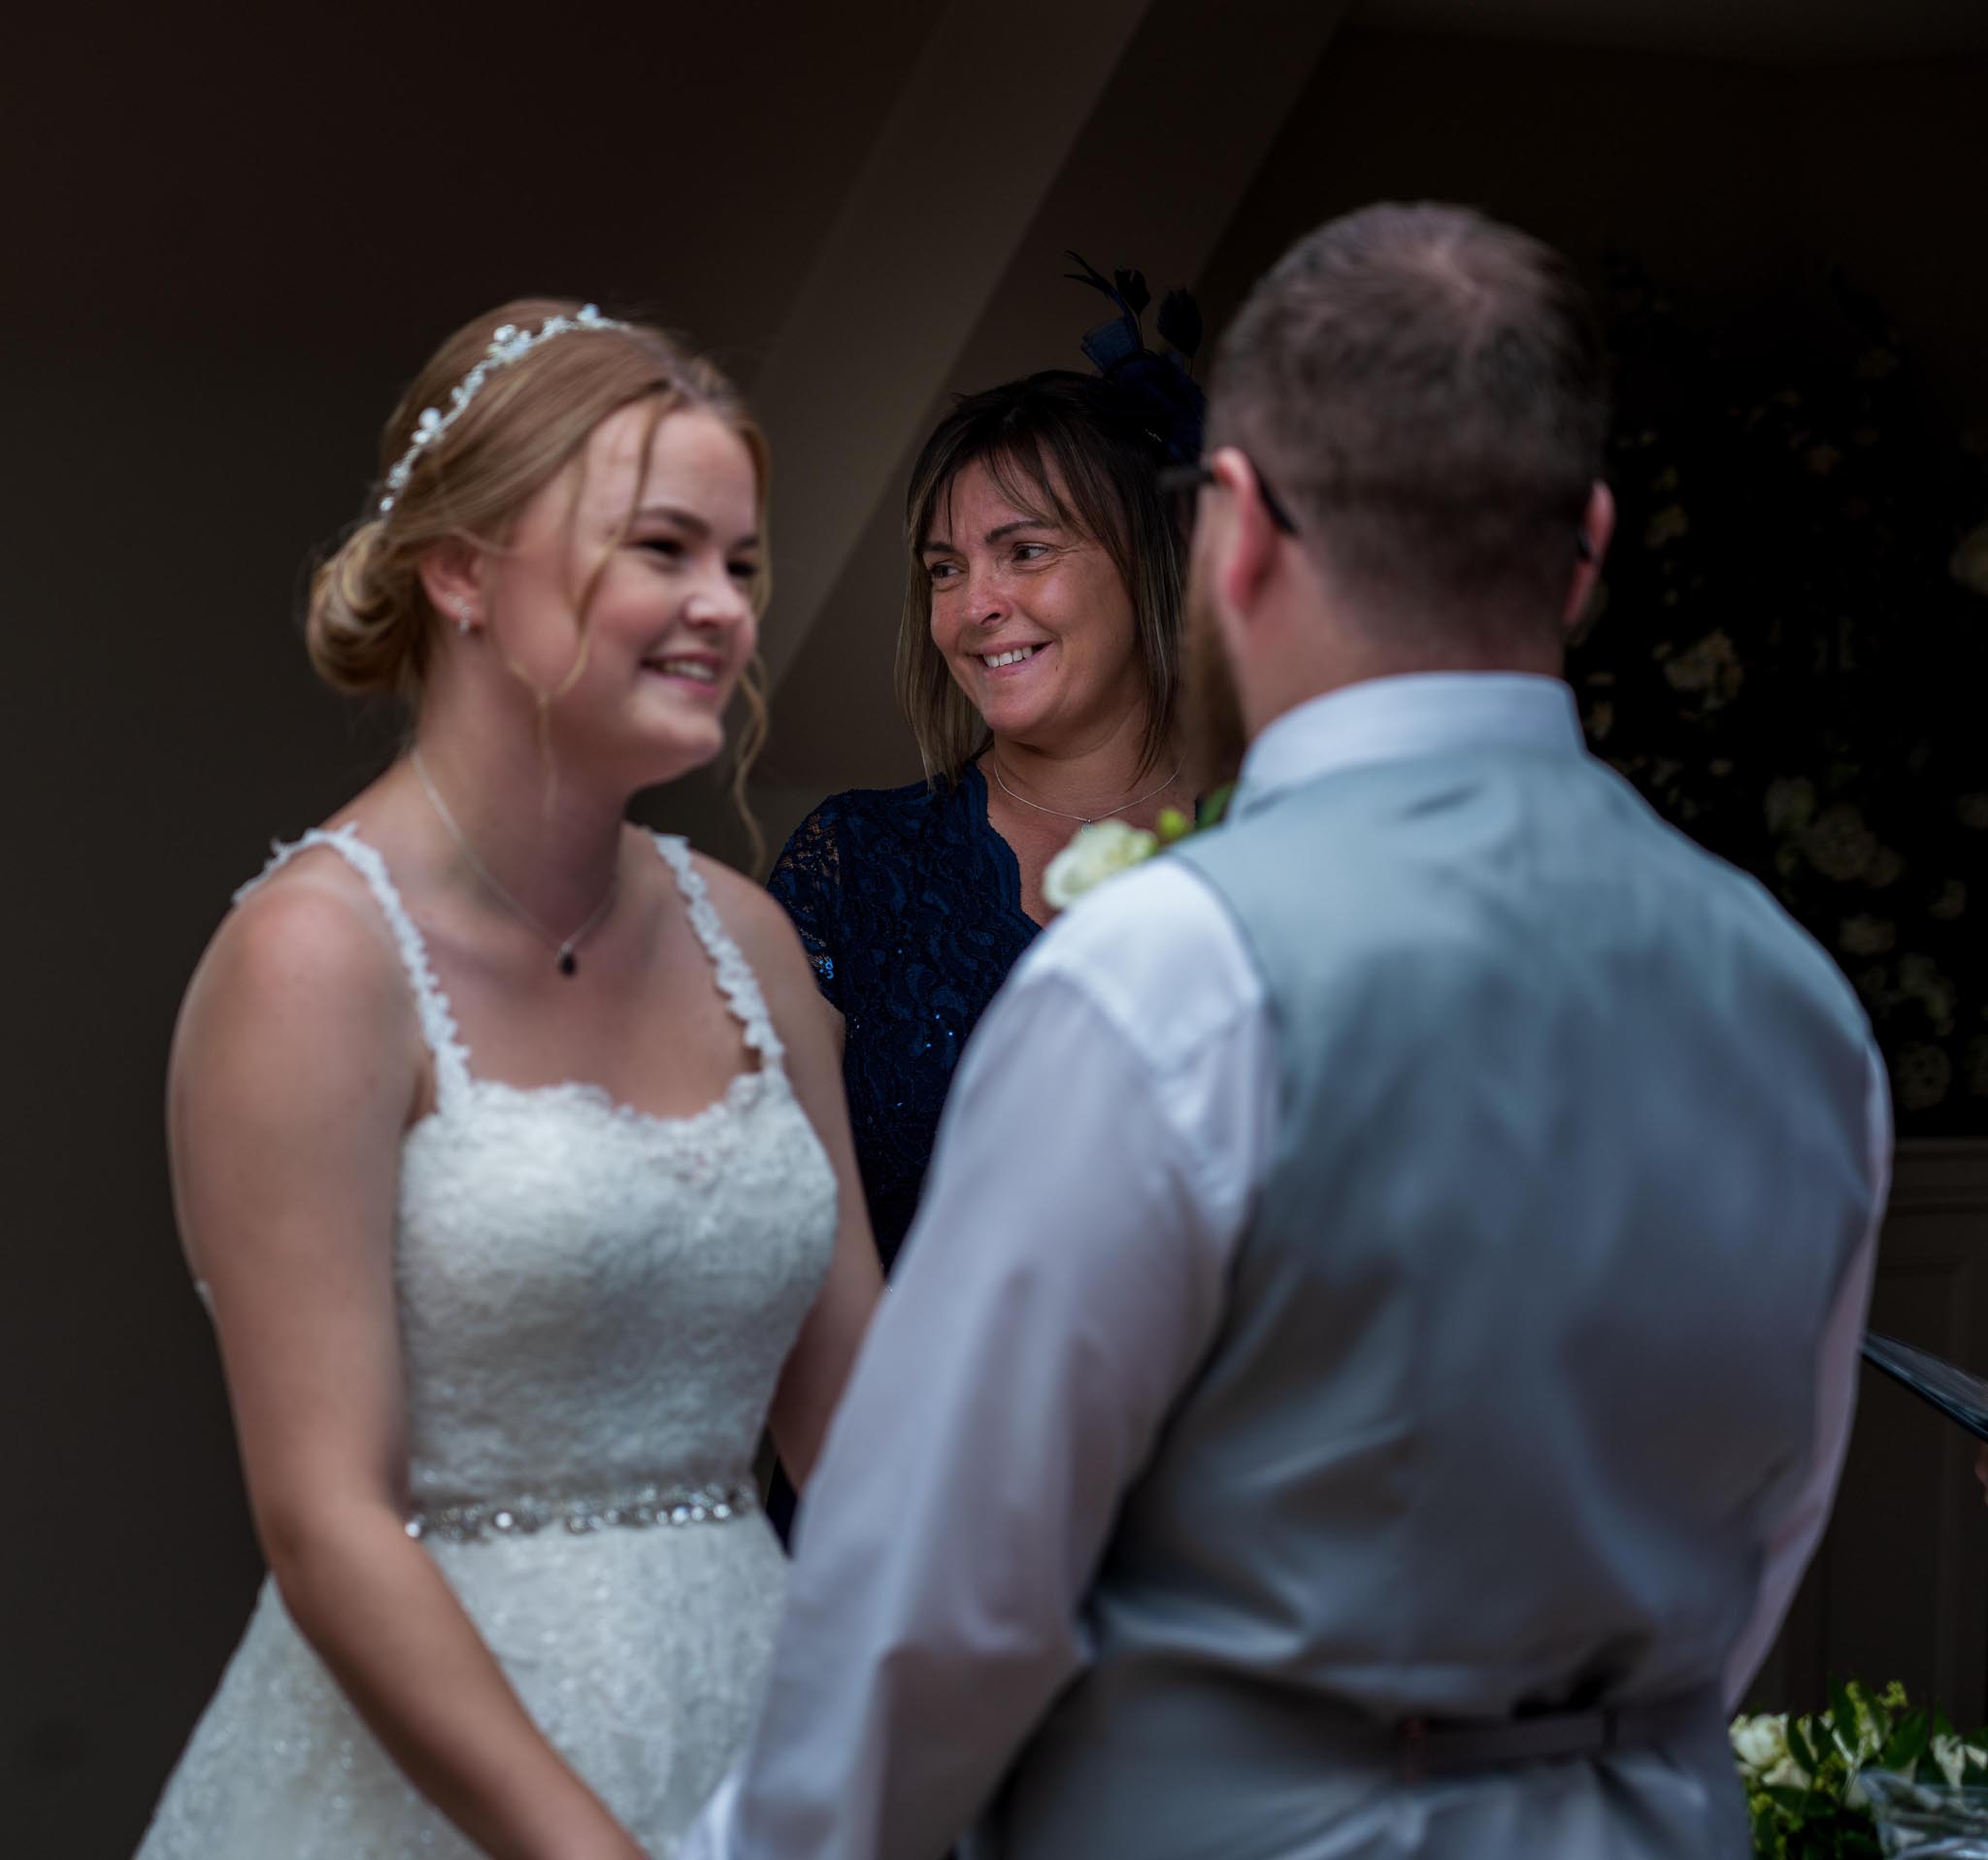 350-Ceremony-Luke-Yasmin-The-Rayleigh-Club-Wedding-Photography.jpg